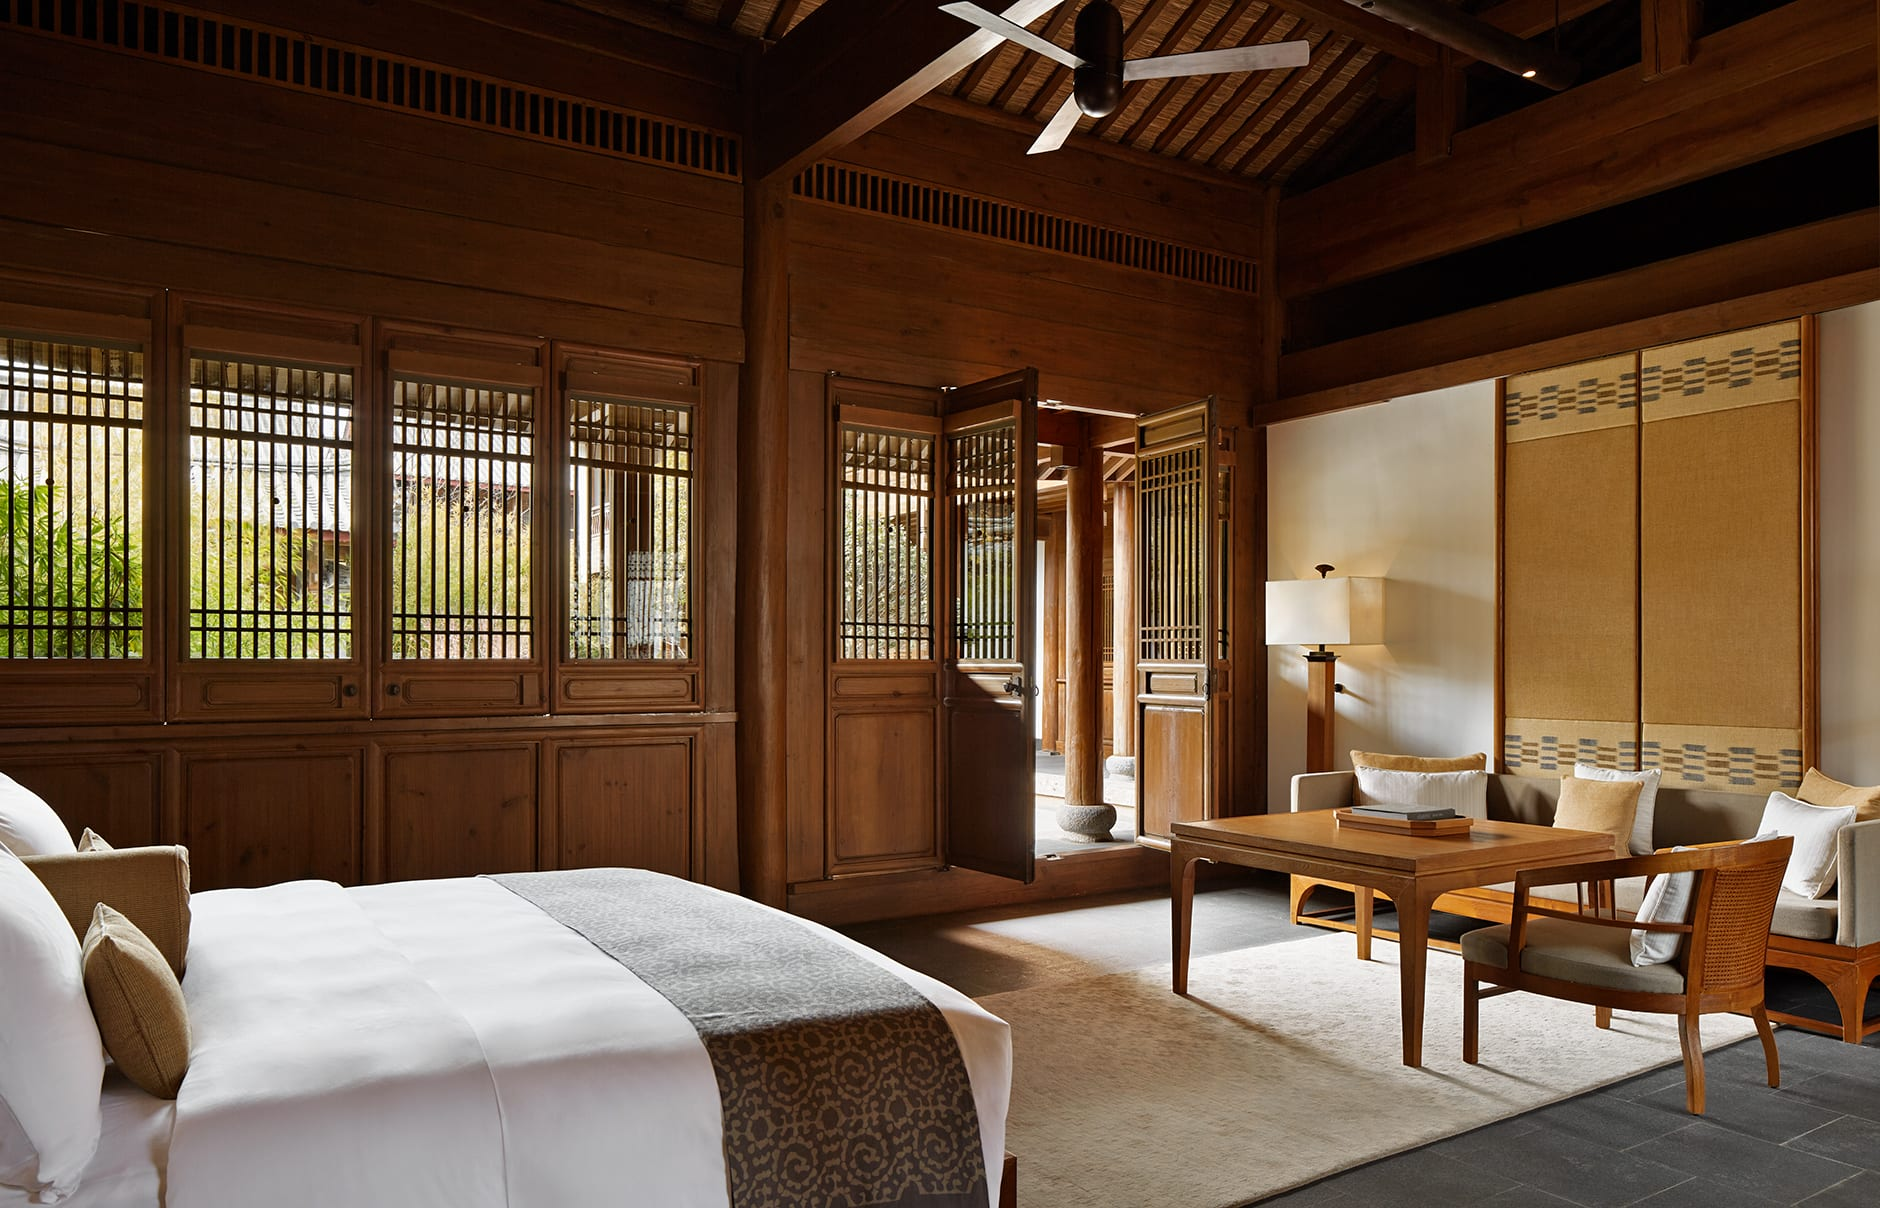 Amandayan, Lijiang, China. Luxury Hotel Review by TravelPlusStyle. Photo © Aman Resorts